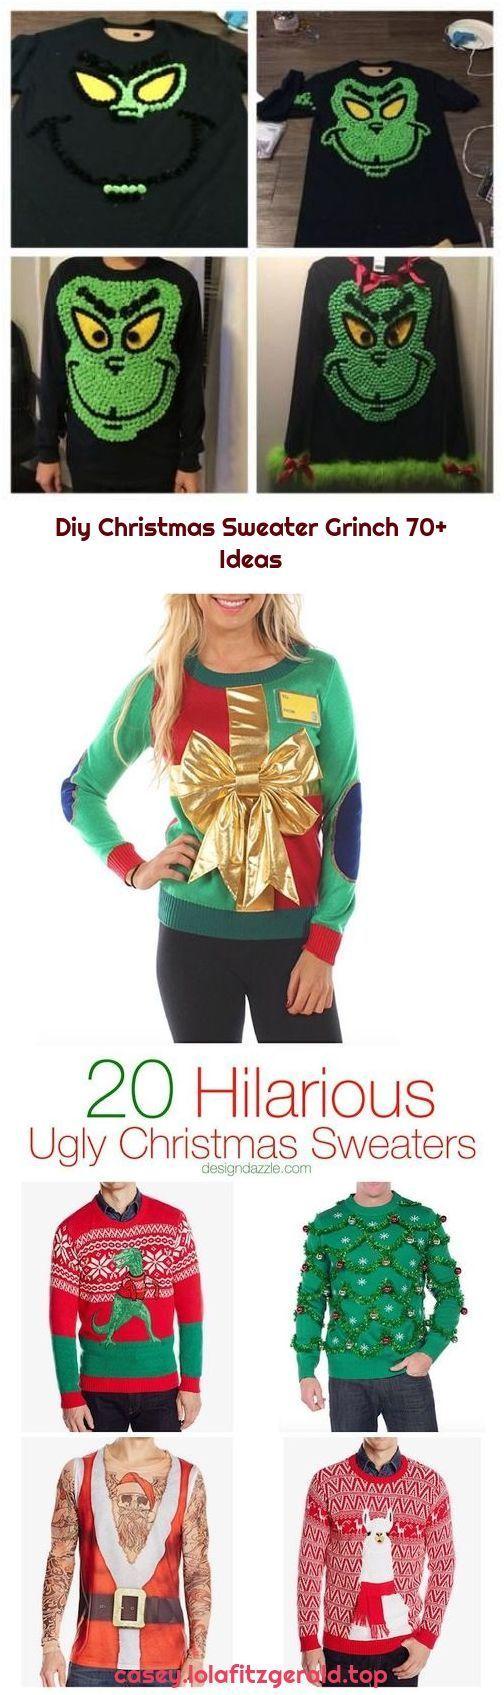 Diy Christmas Sweater Grinch 70+ Ideas christmas diy